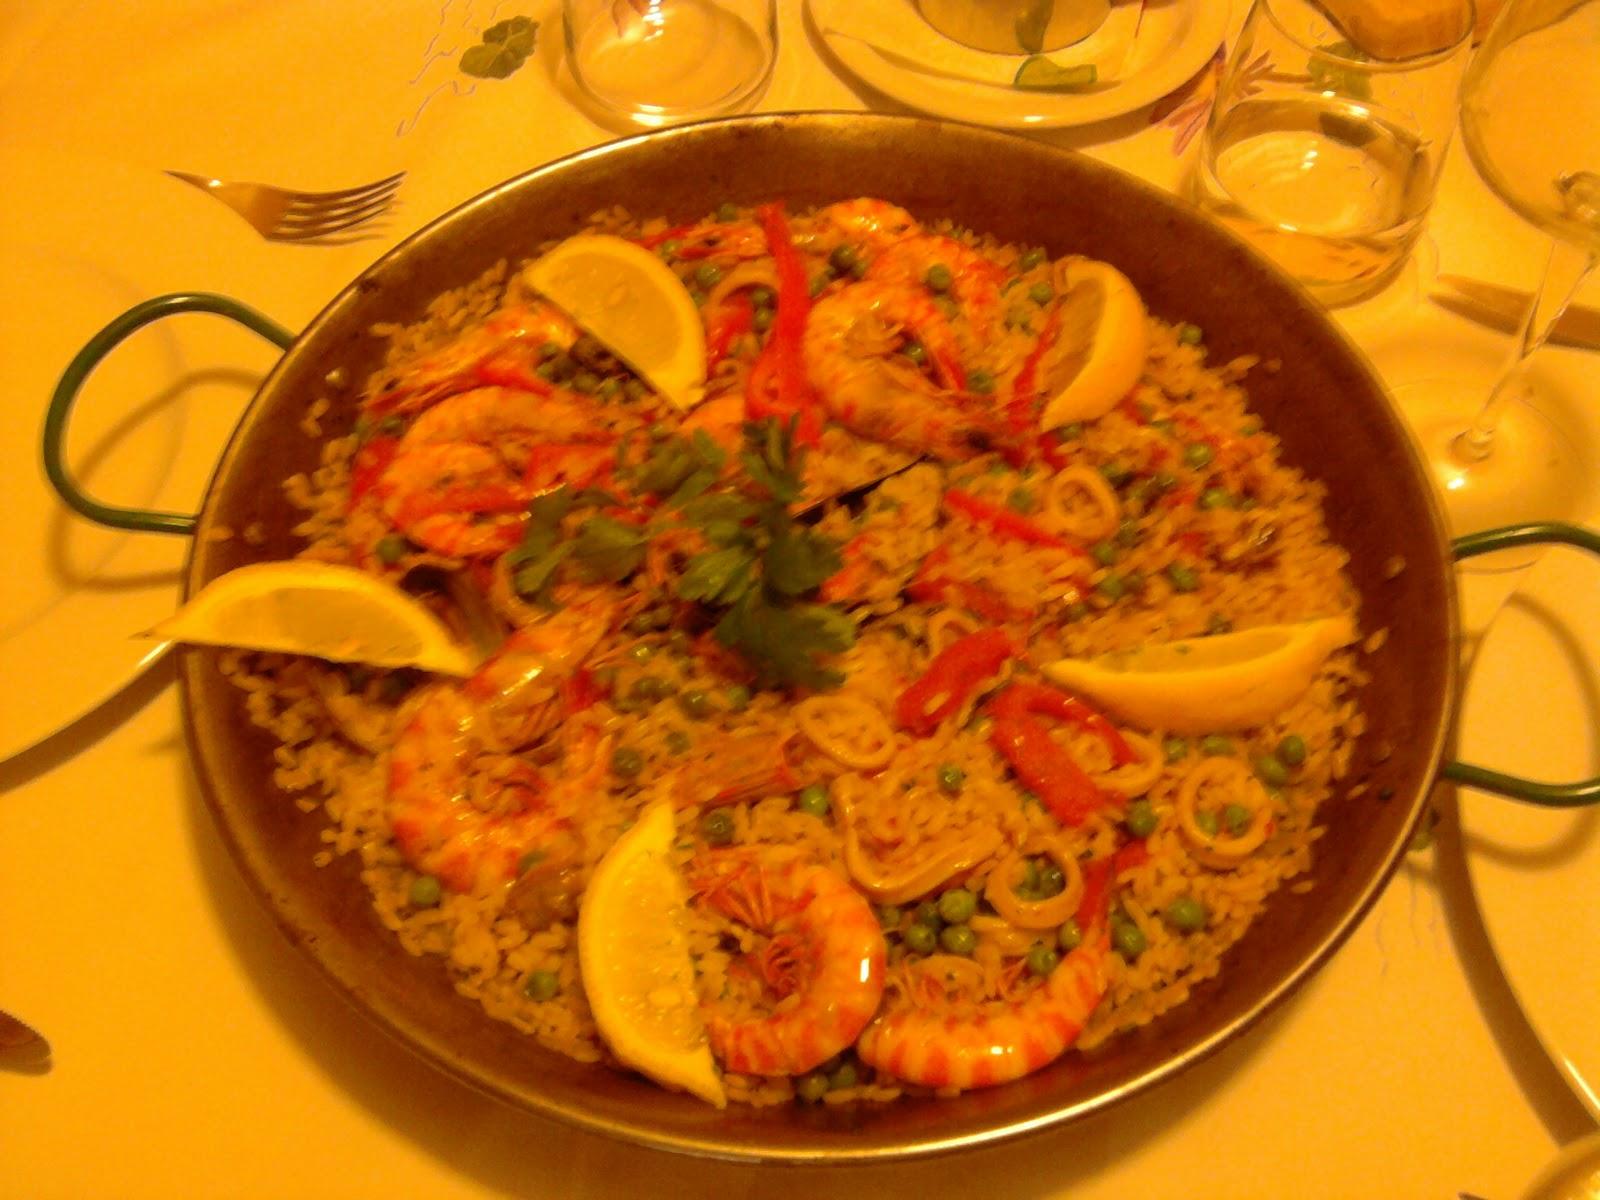 Nicola ricci cucina passione cucina spagnola - Sesso in cucina ...